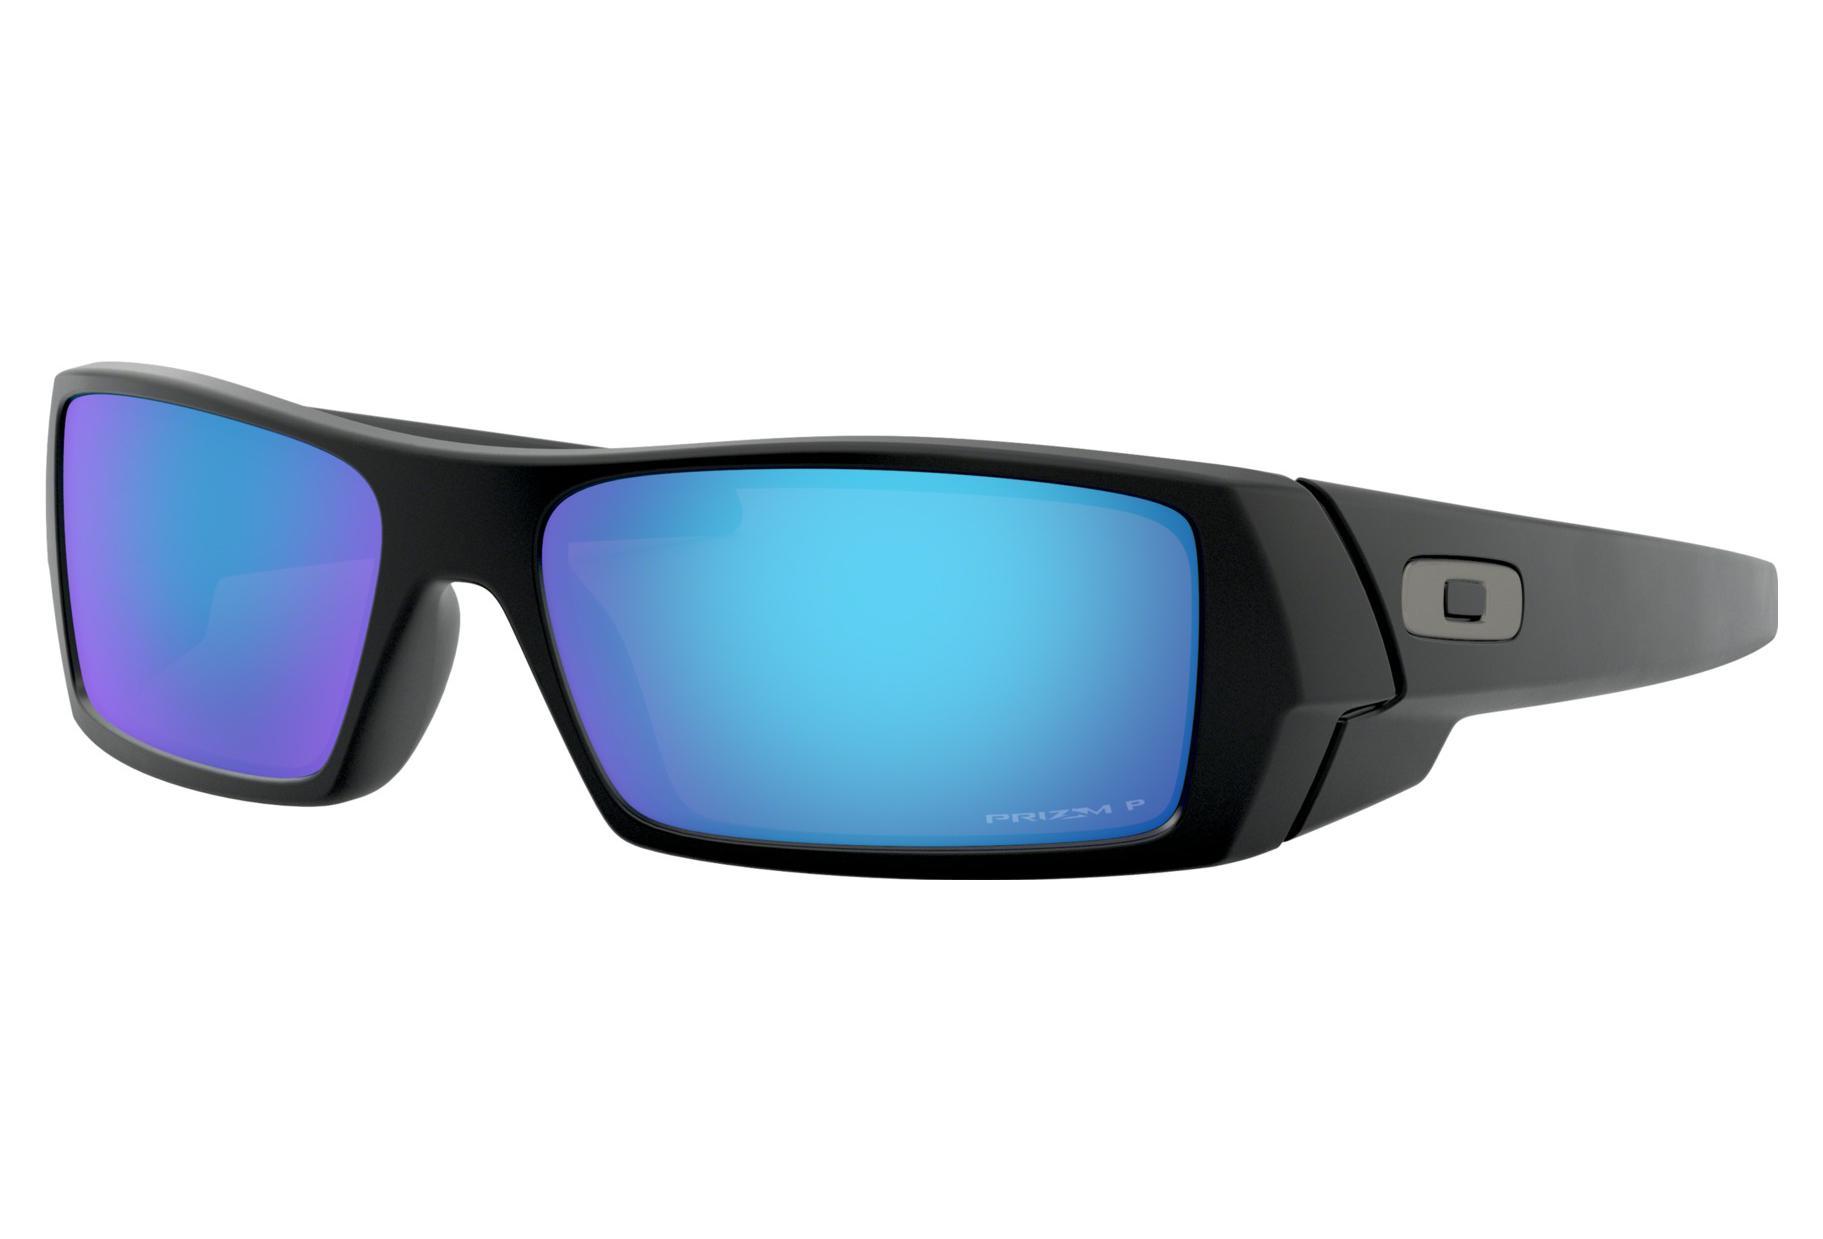 62aa510bc32 Oakley Sunglasses Gascan   Matte Black   Prizm Sapphire Polarized   Ref.  OO9014-5060